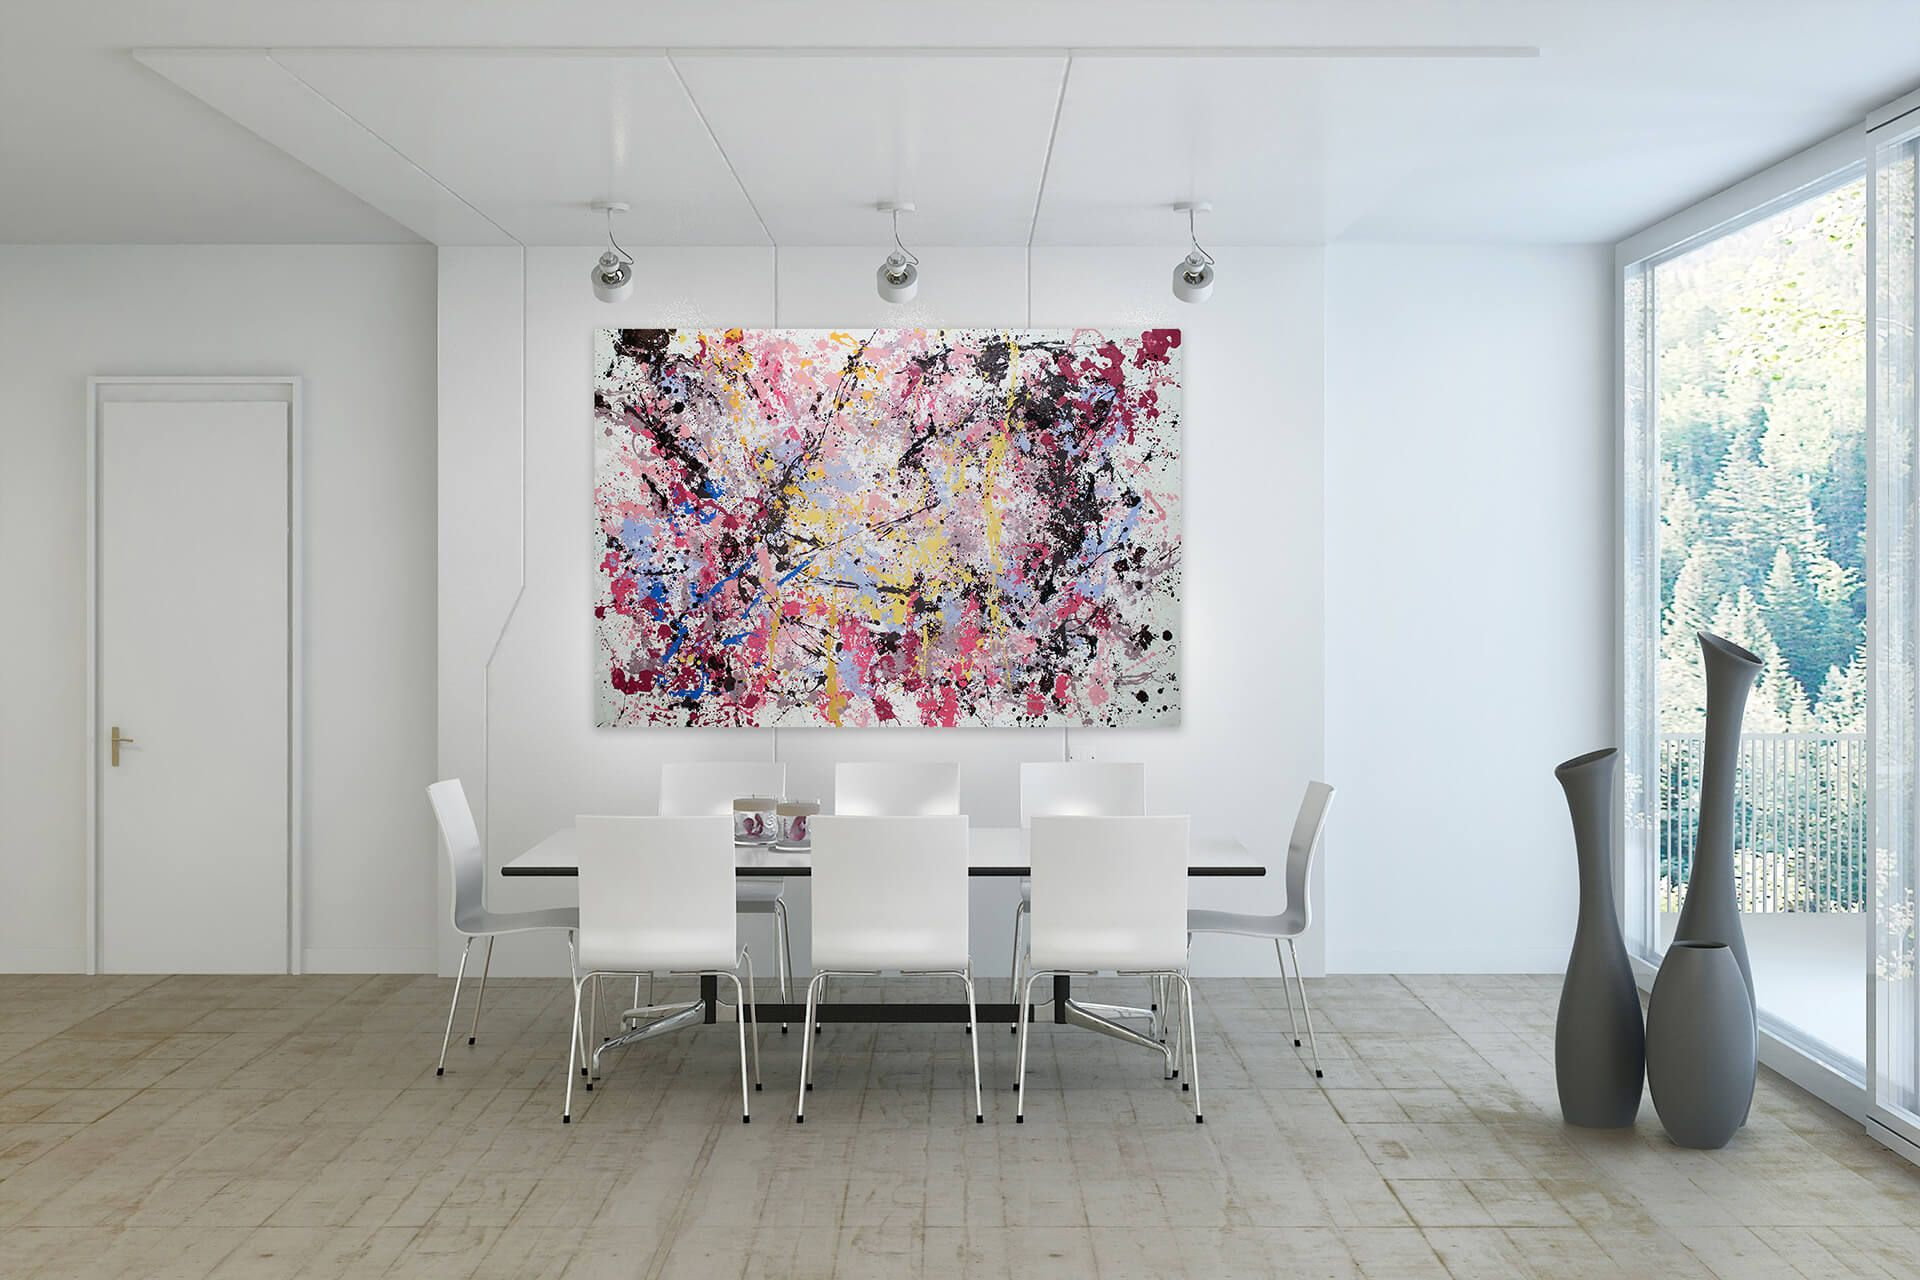 Öl Gemälde Infinite Joy 180x120cm Gemälde Grüne Gemälde Moderne Gemälde